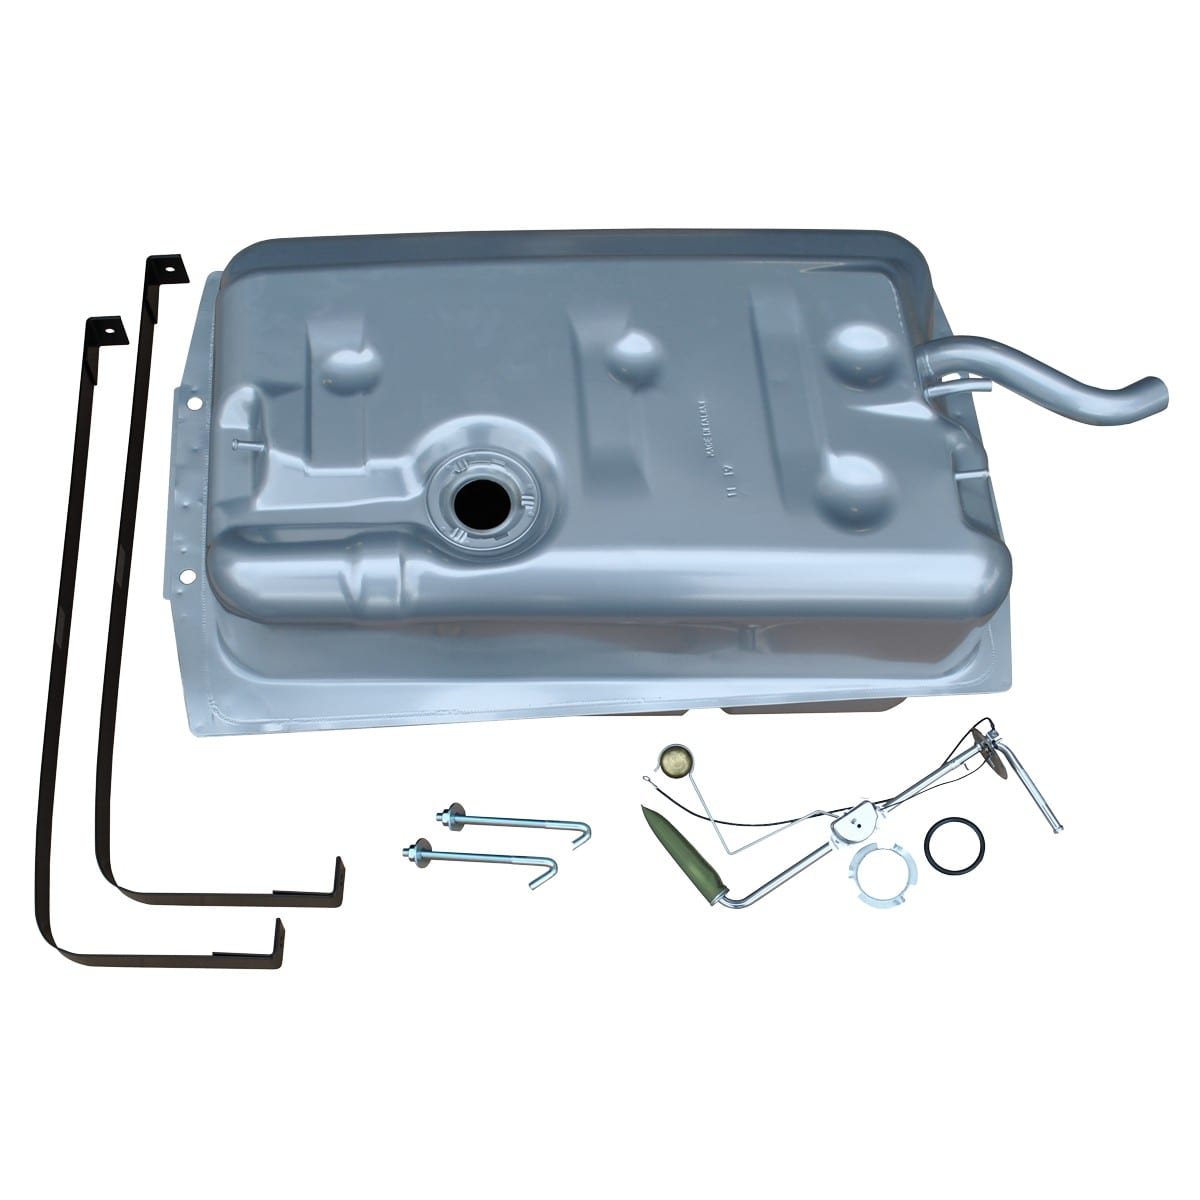 New Fuel Sending Unit Gas Level Chevy Blazer Suburban GMC Jimmy Chevrolet K5 C10